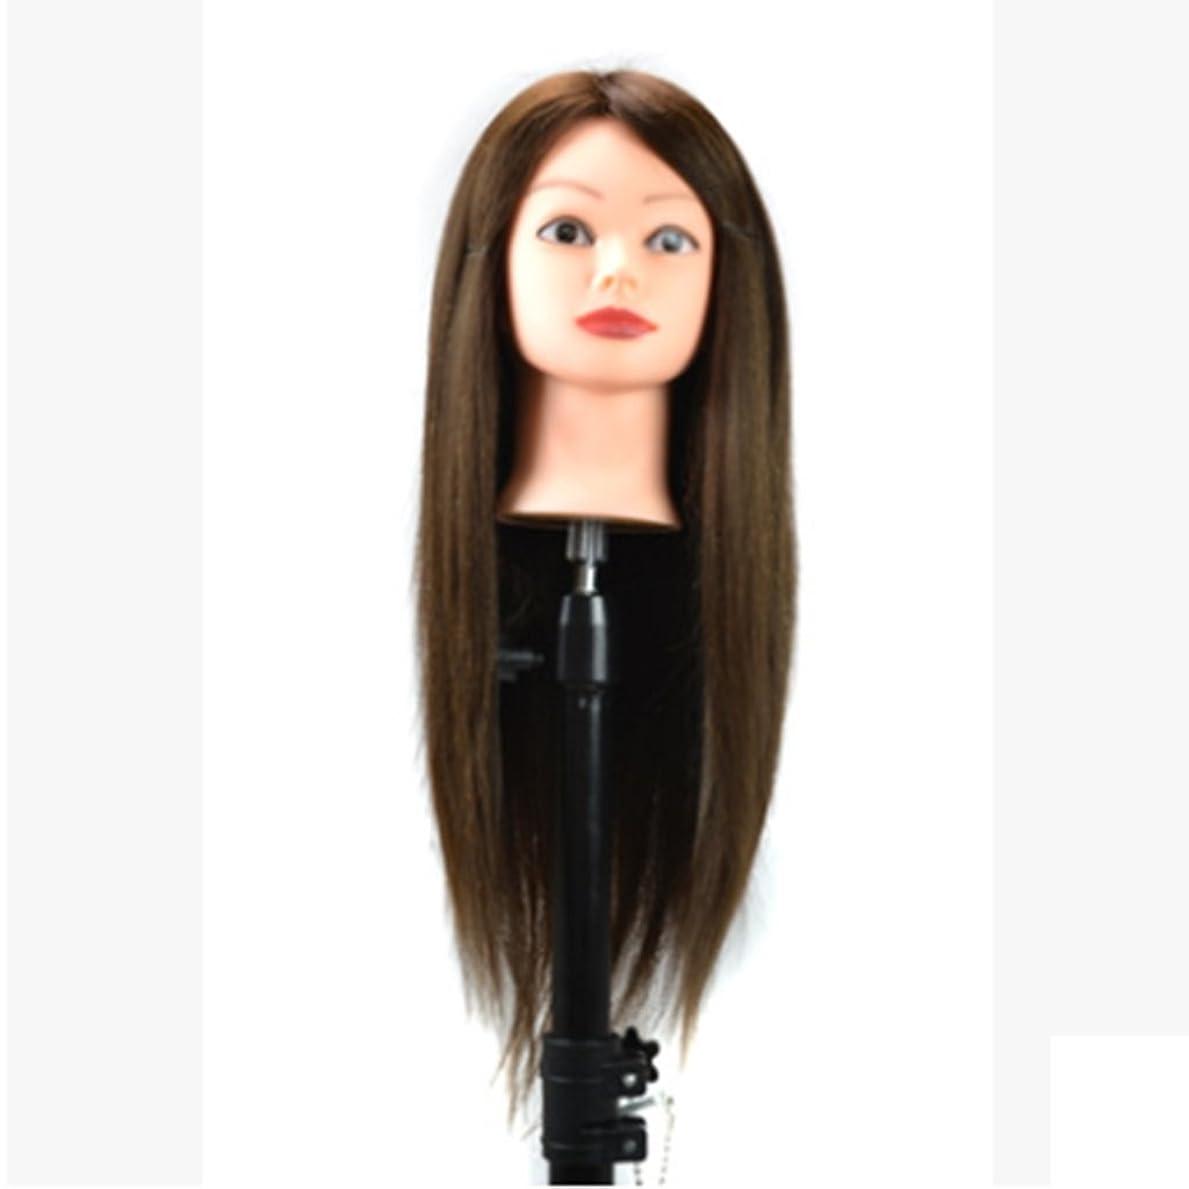 Koloeplf ブラケットを含む 60cm ウィッグ ヘッド 染色が可能で、メイク アップ ウィッグ ヘッド 付き ディスクと編組髪 (Color : ブラウン)